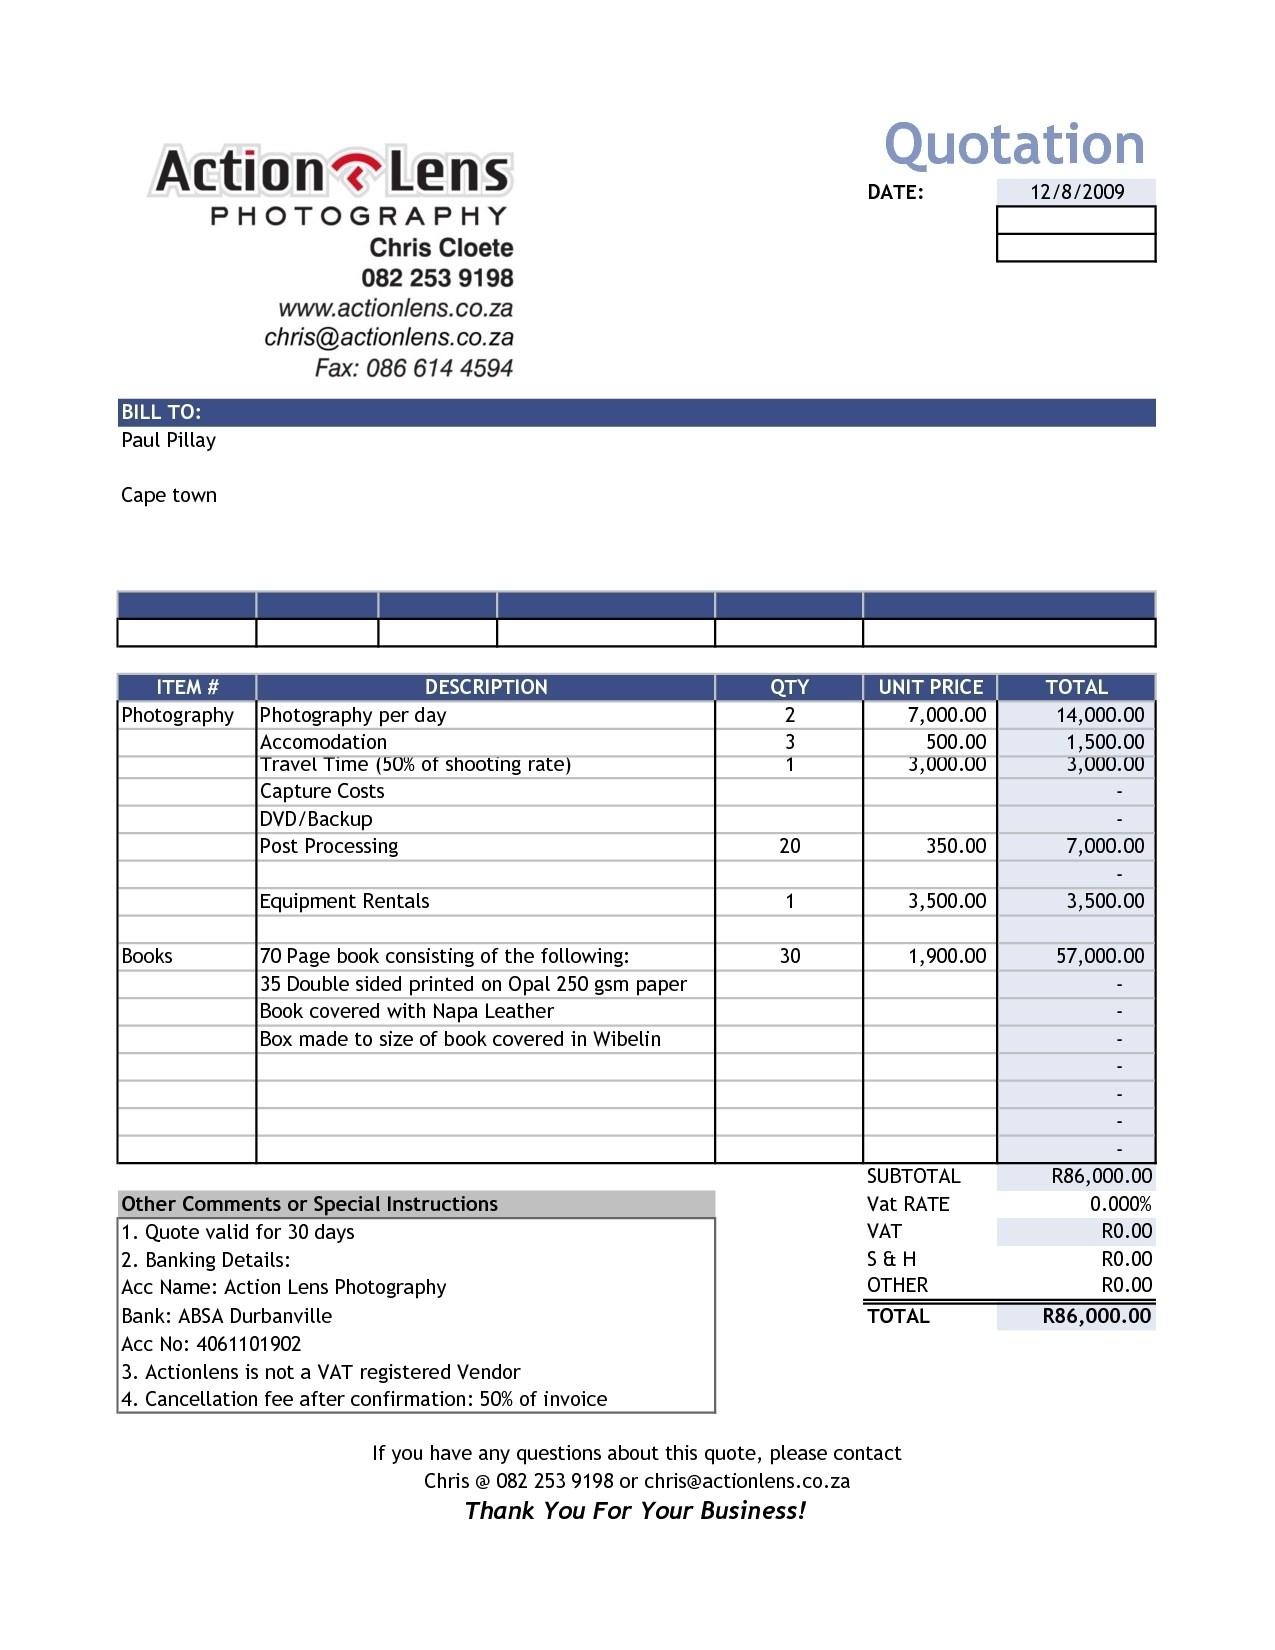 employee invoice template 8 free freelance invoice templates in employee invoice template